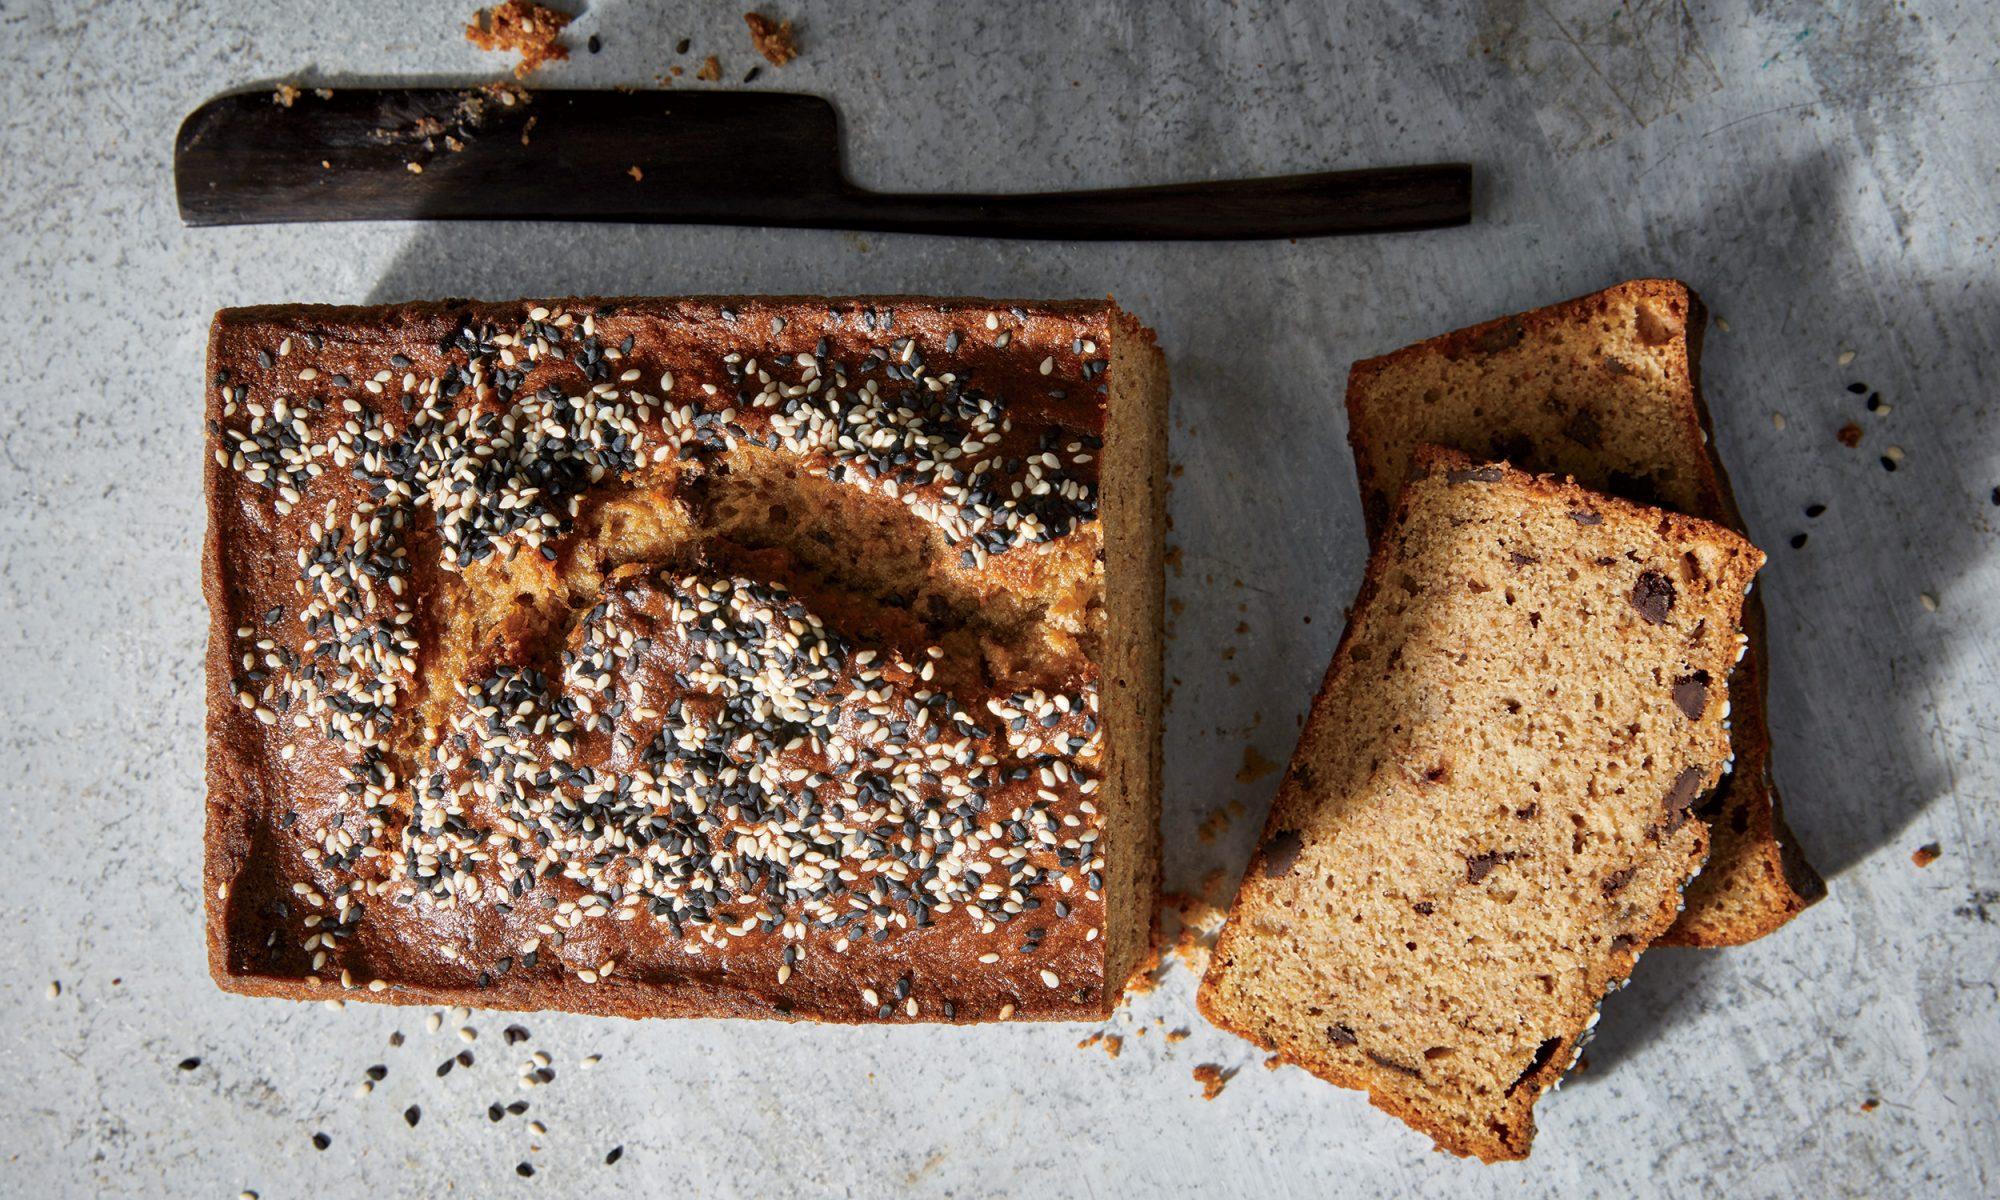 EC: Chocolate-Tahini Banana Bread Is 10/10 Would Bake Again